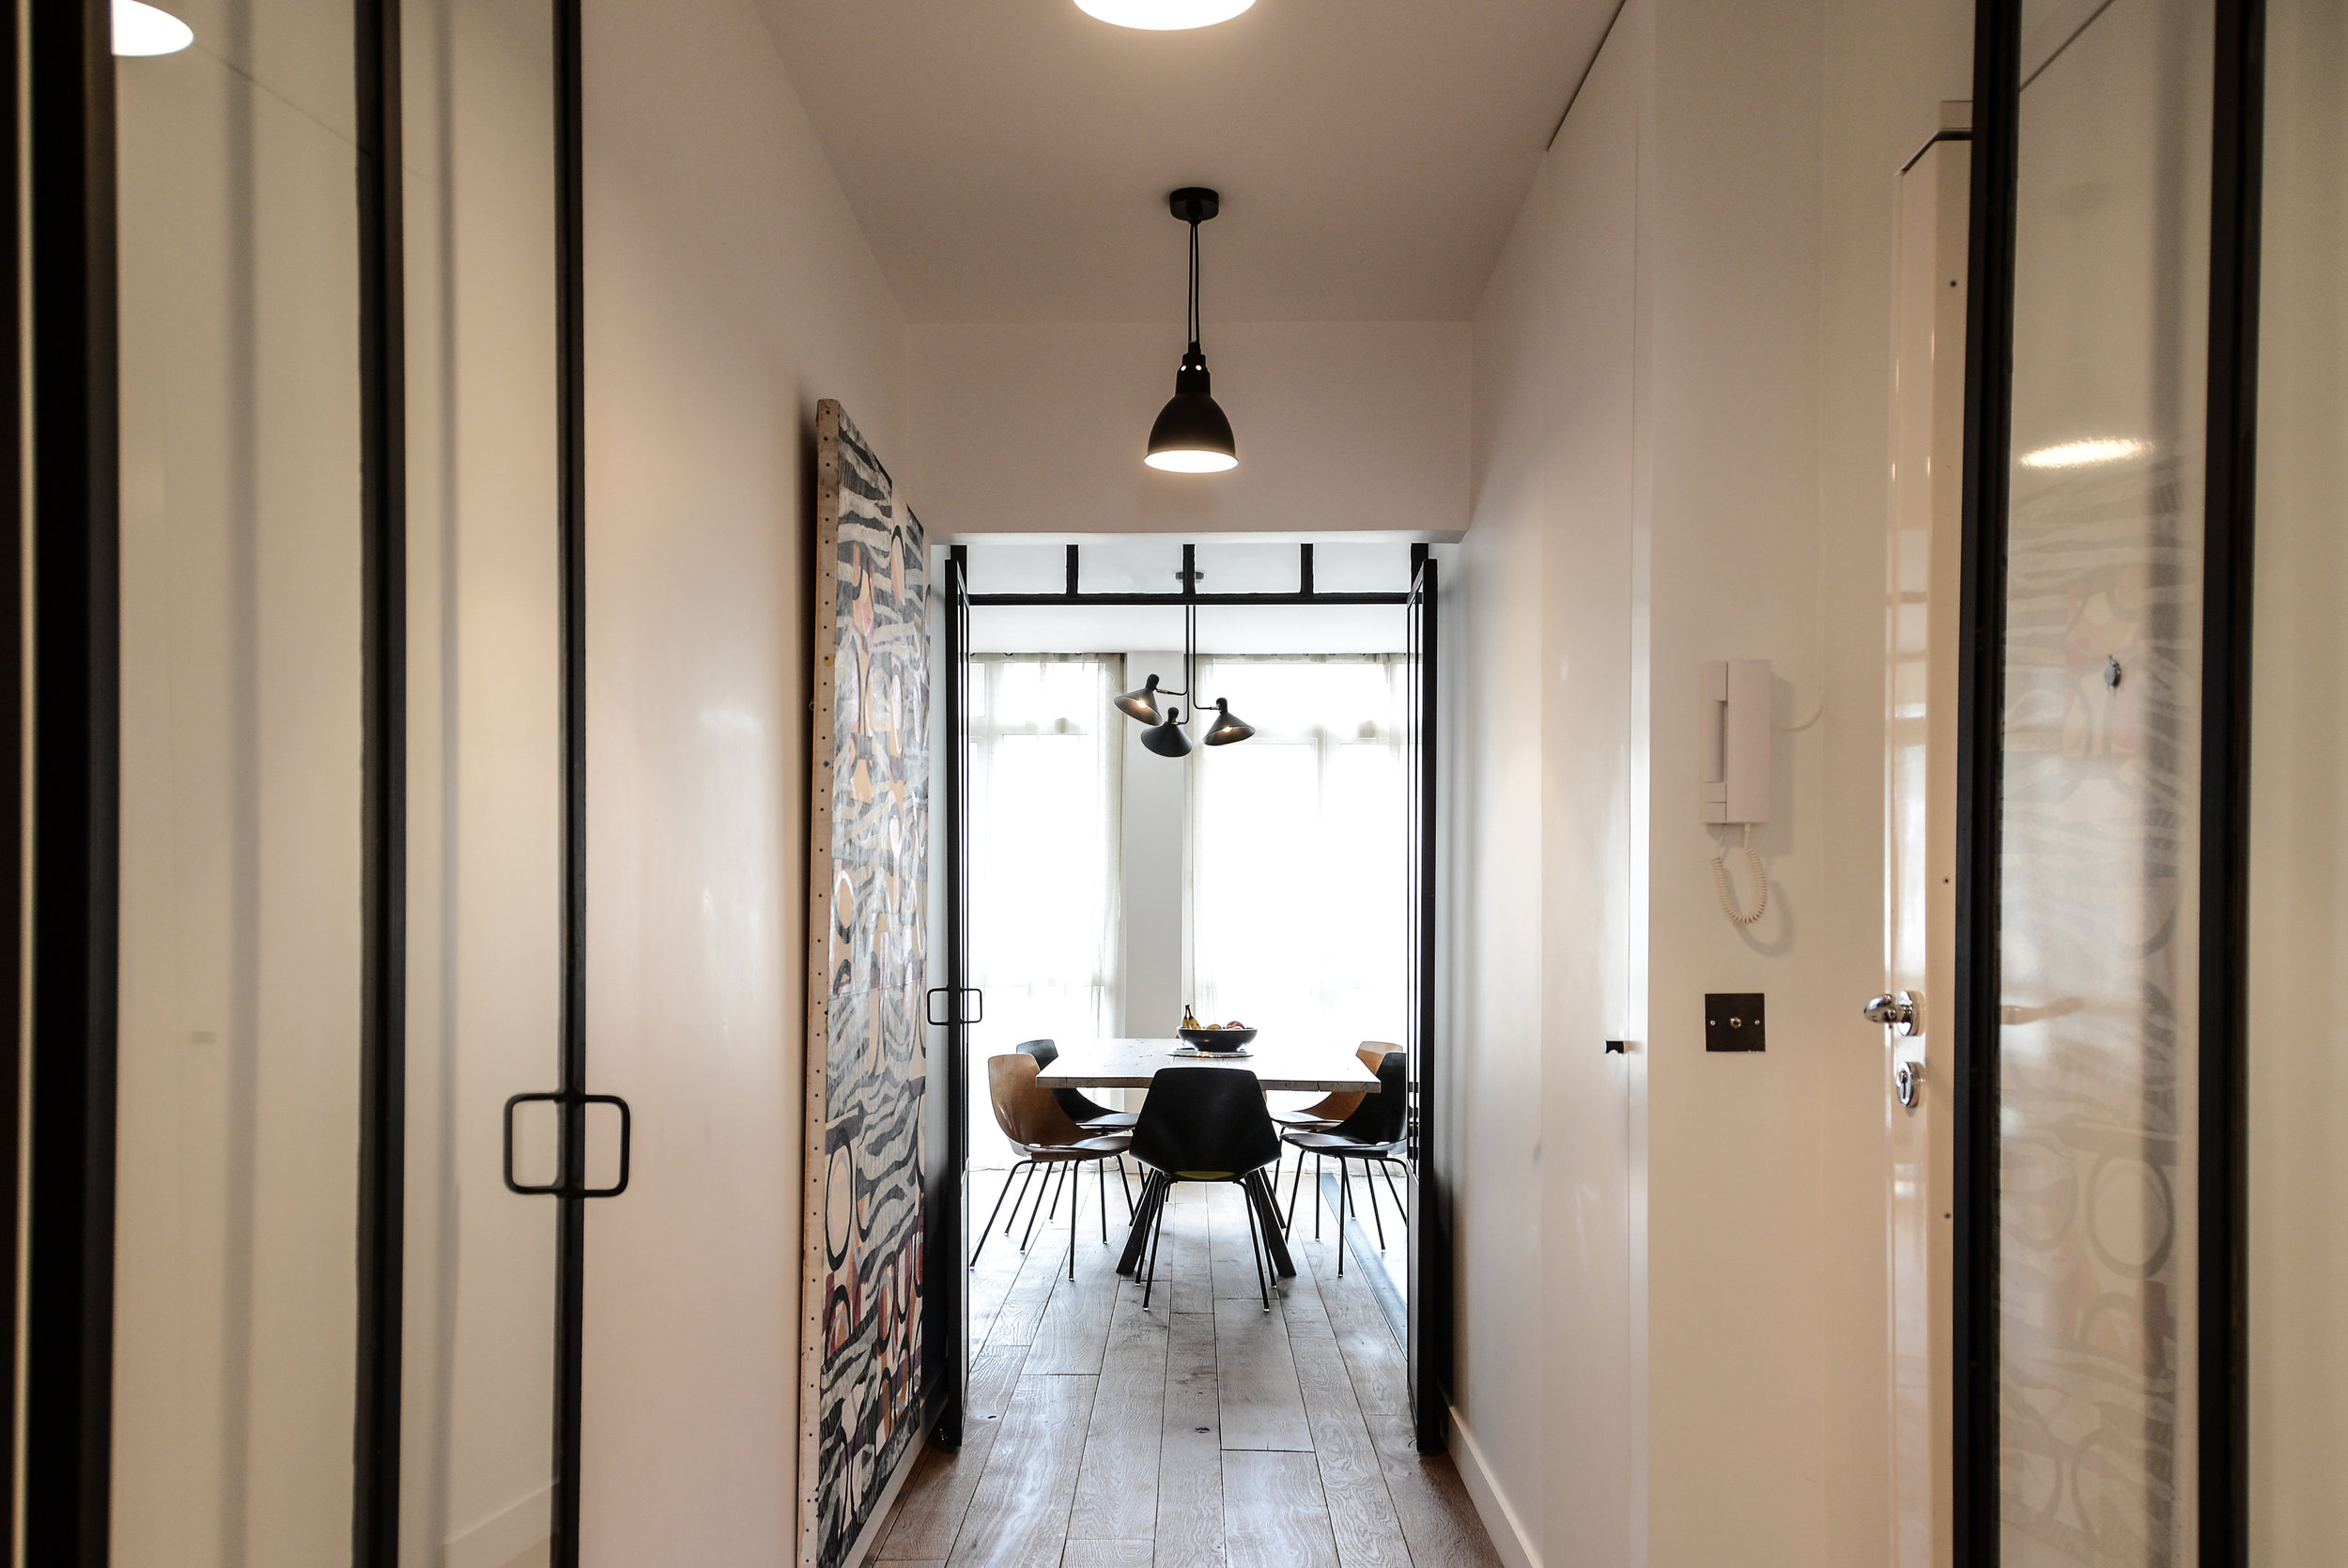 nicolasvade_architecture_interieur_design_paris_bineau_03bis.jpg